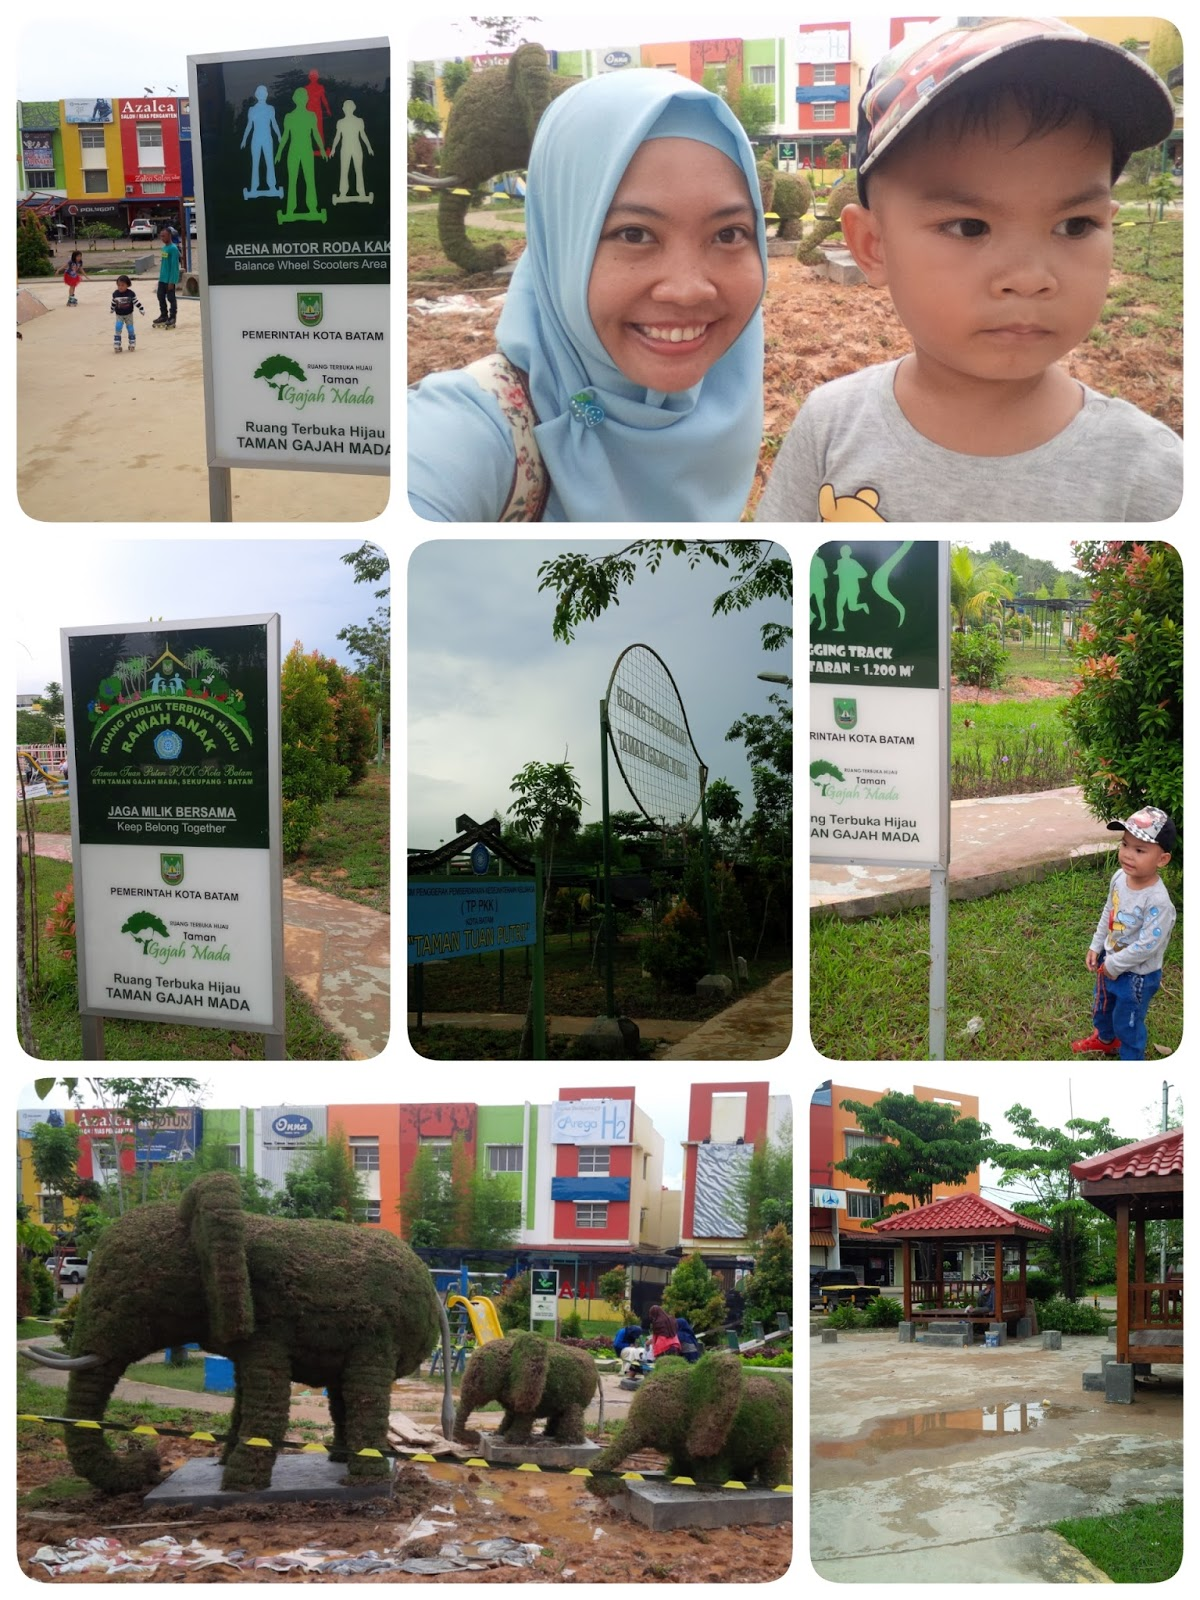 Ruang terbuka hijau taman gajah mada batam